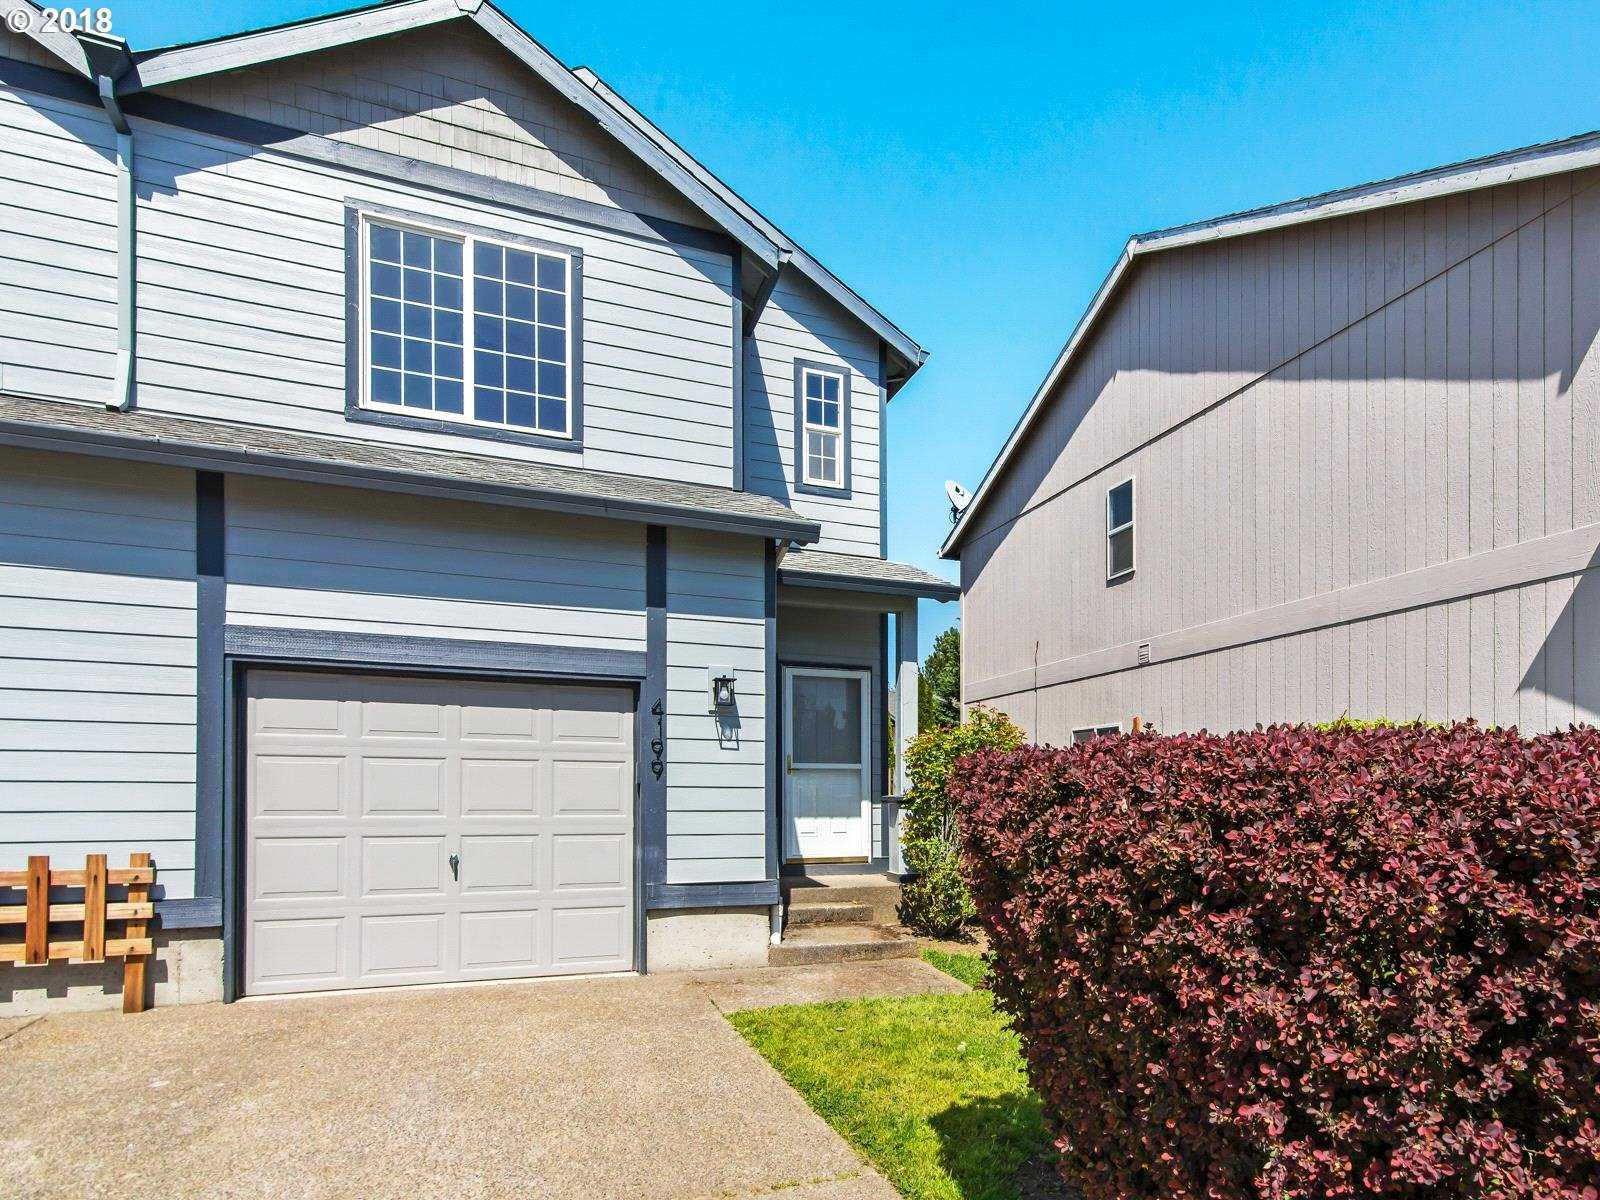 $300,000 - 3Br/3Ba -  for Sale in Hillsboro